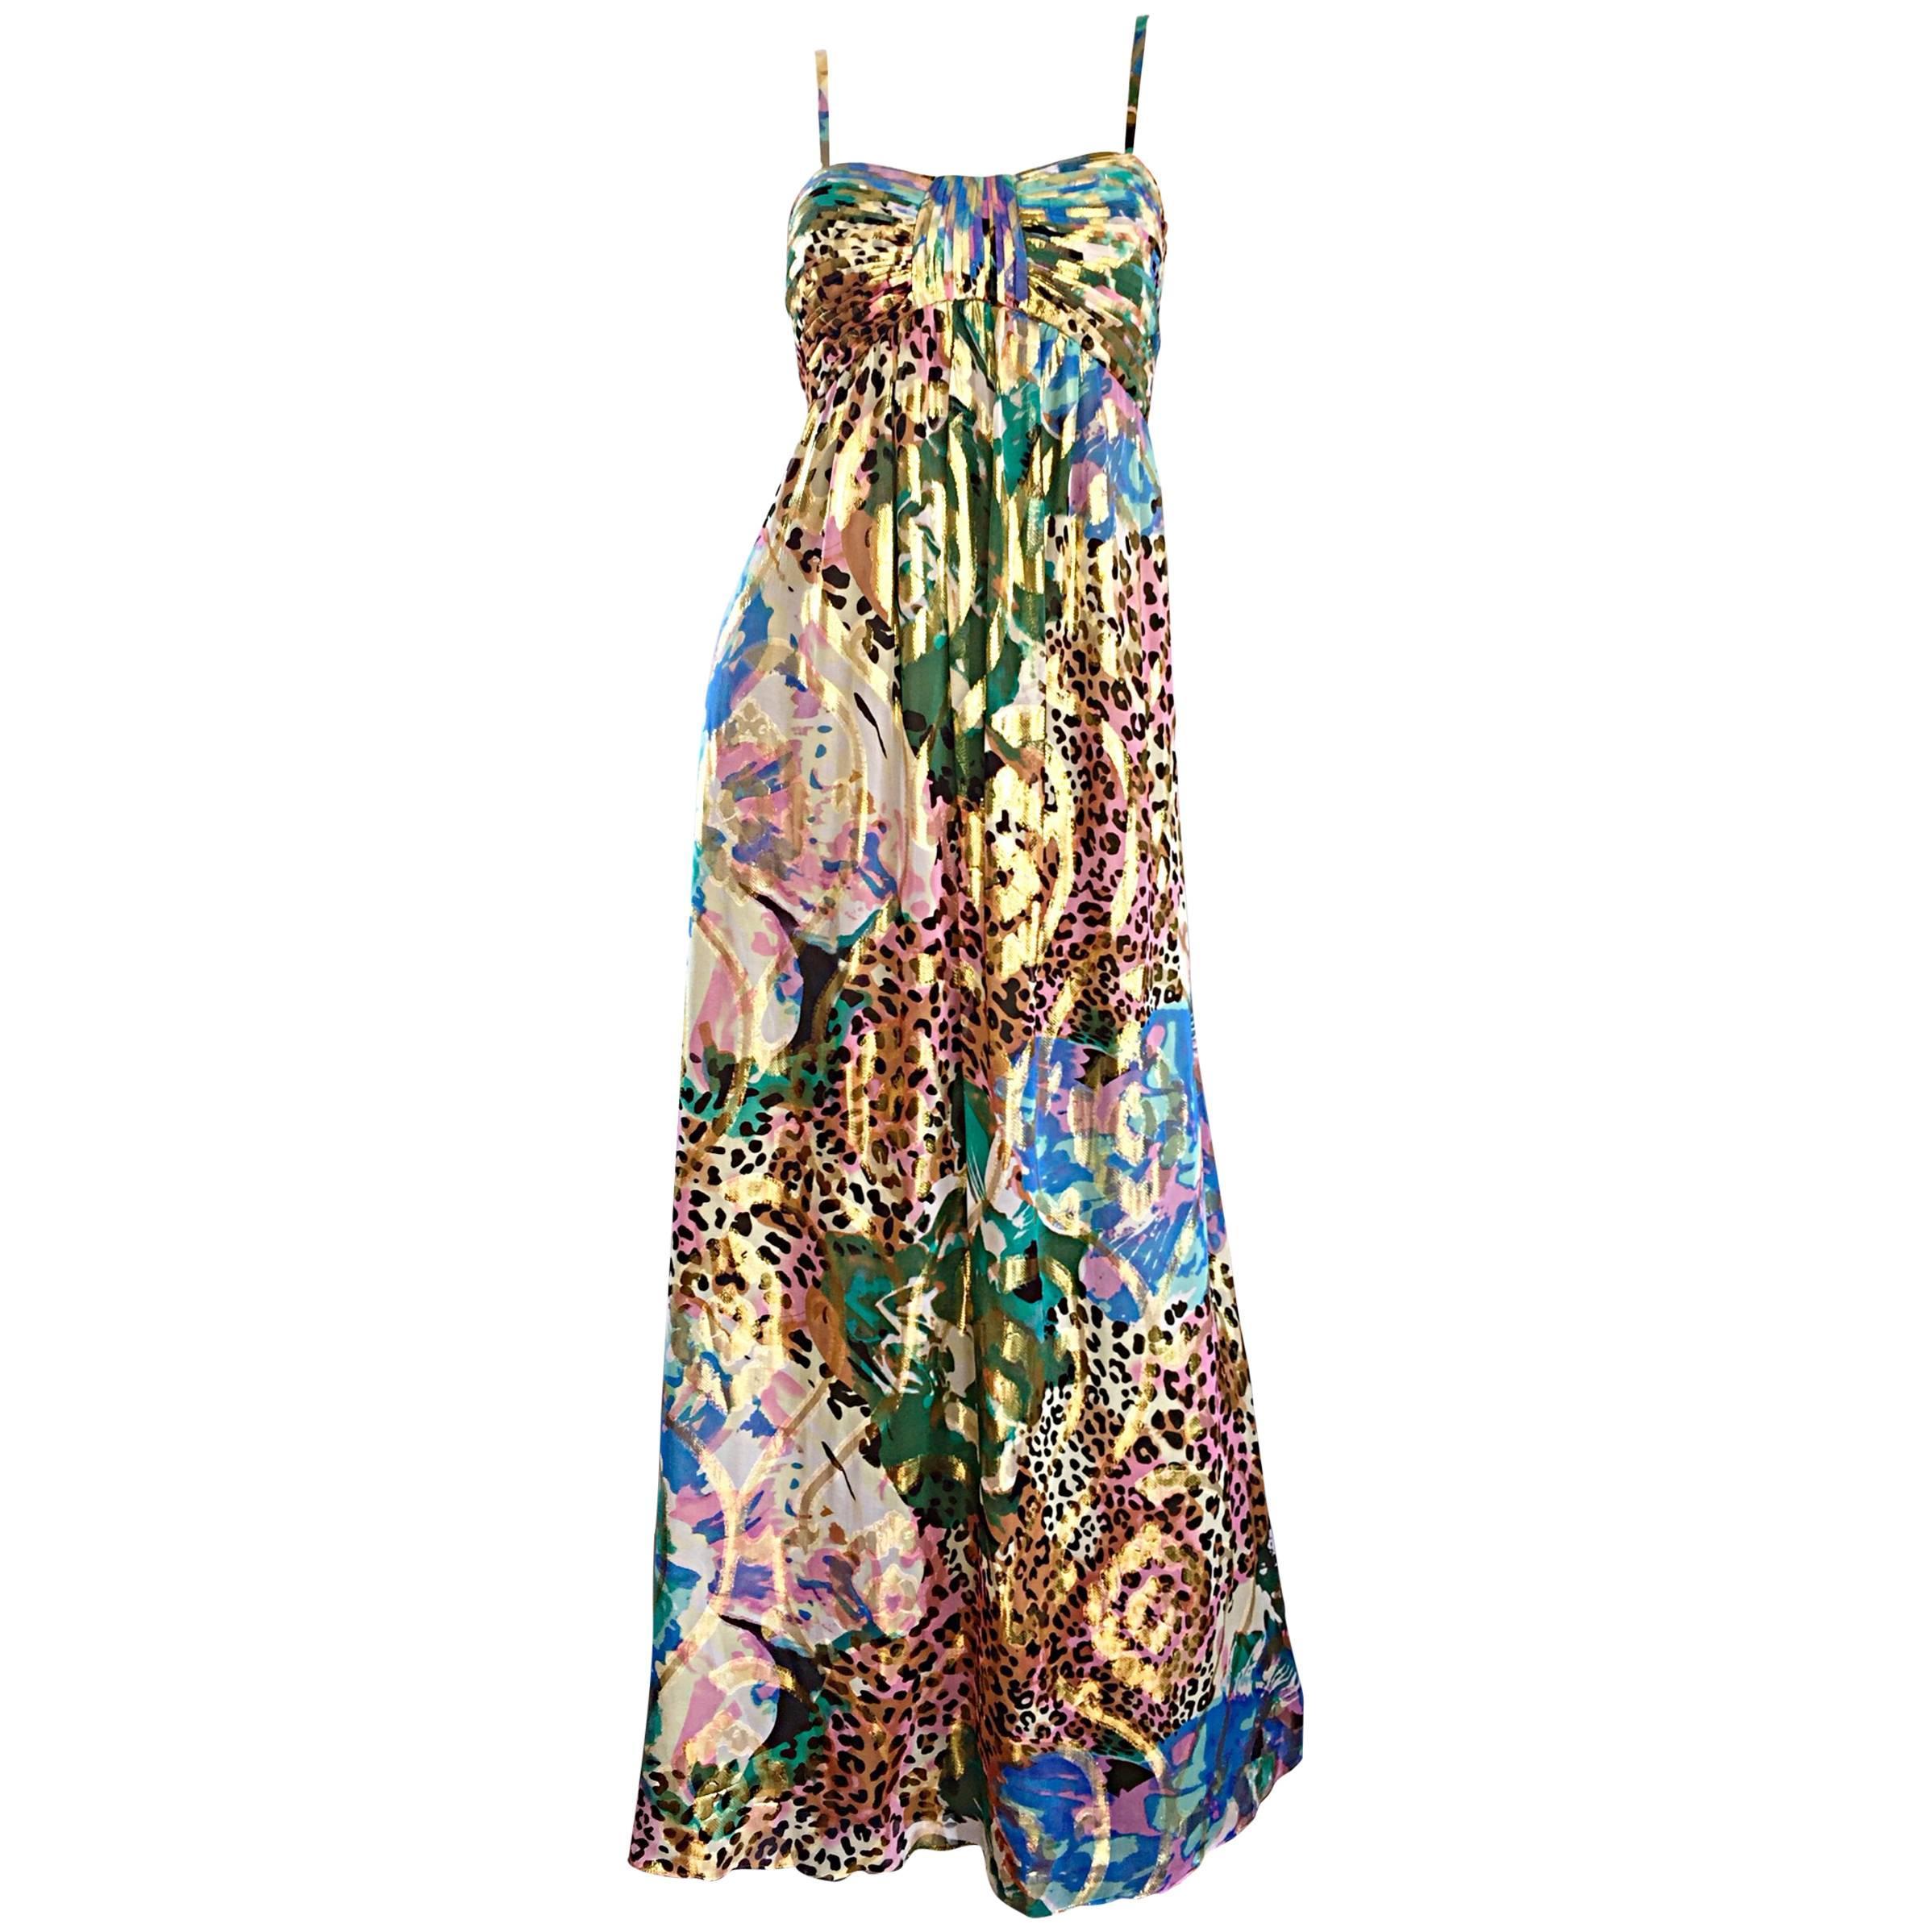 Vintage Oleg Cassini Multi Print Leopard Metallic Floral Abstract Empire Dress